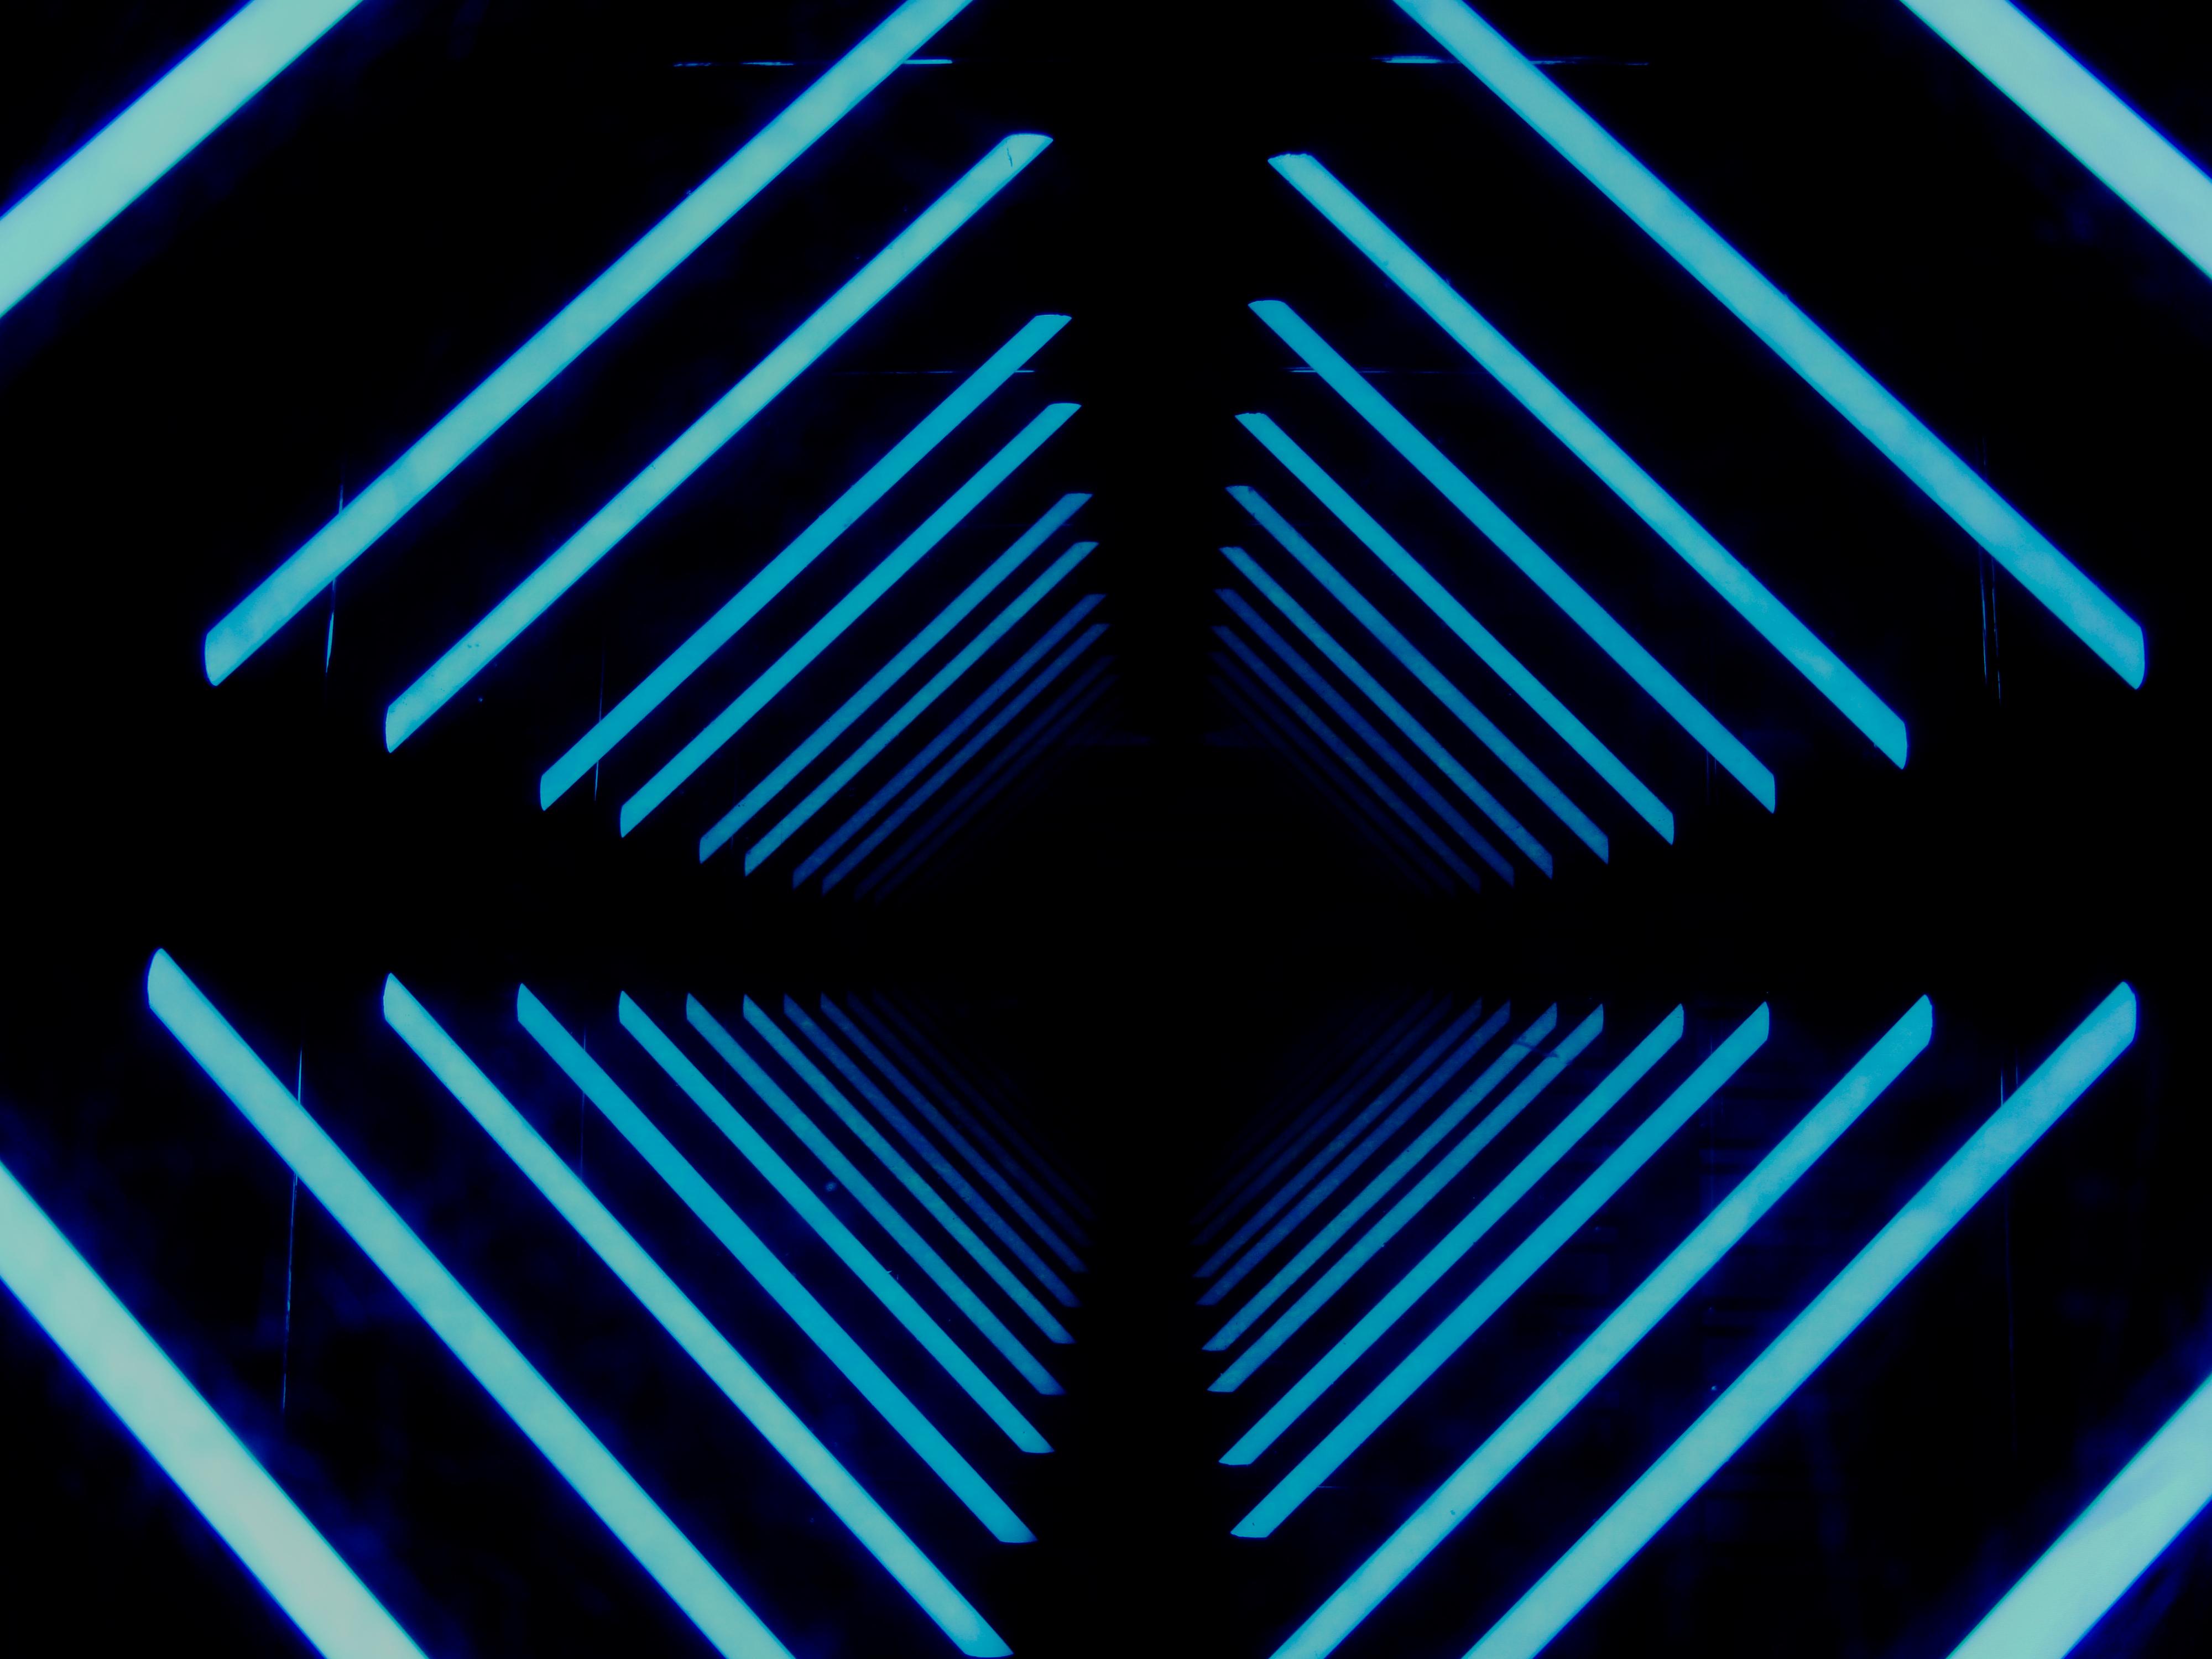 Wallpaper Black Neon Galaxy Symmetry Pattern Circle Angle